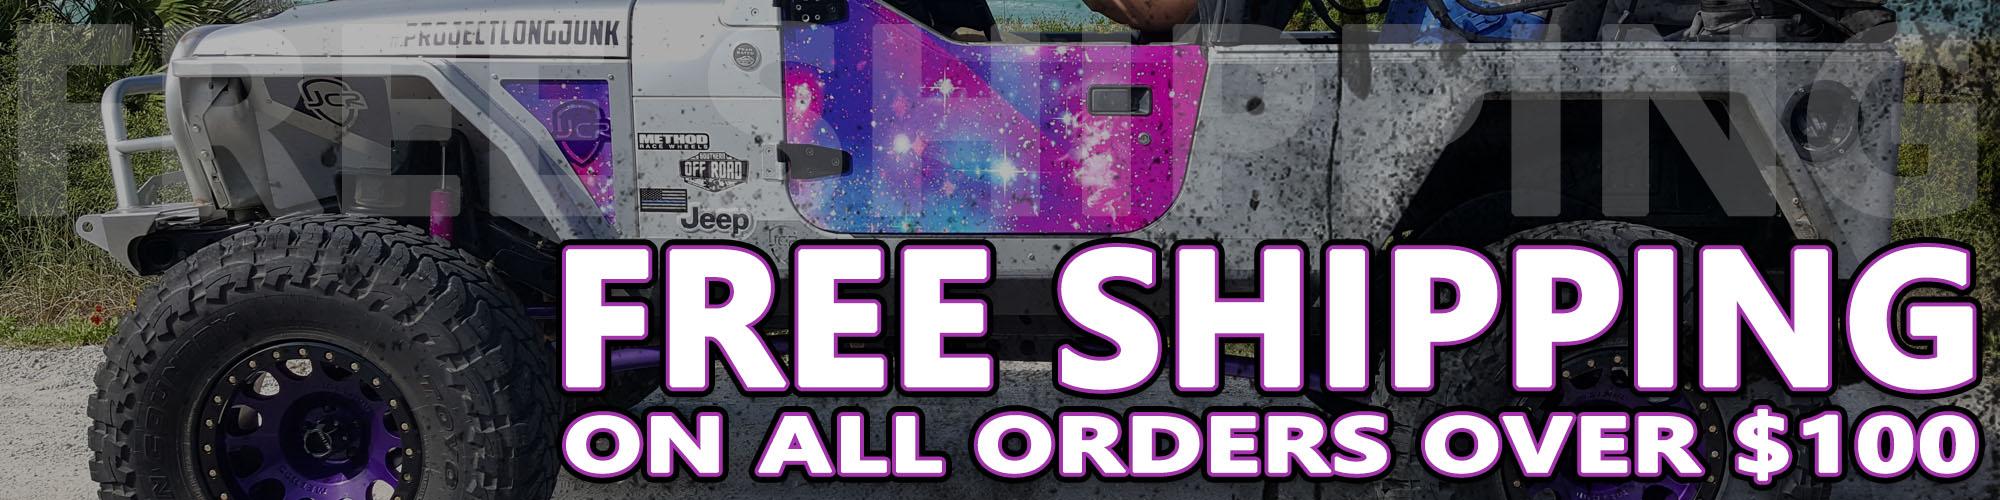 free-shipping-website.jpg